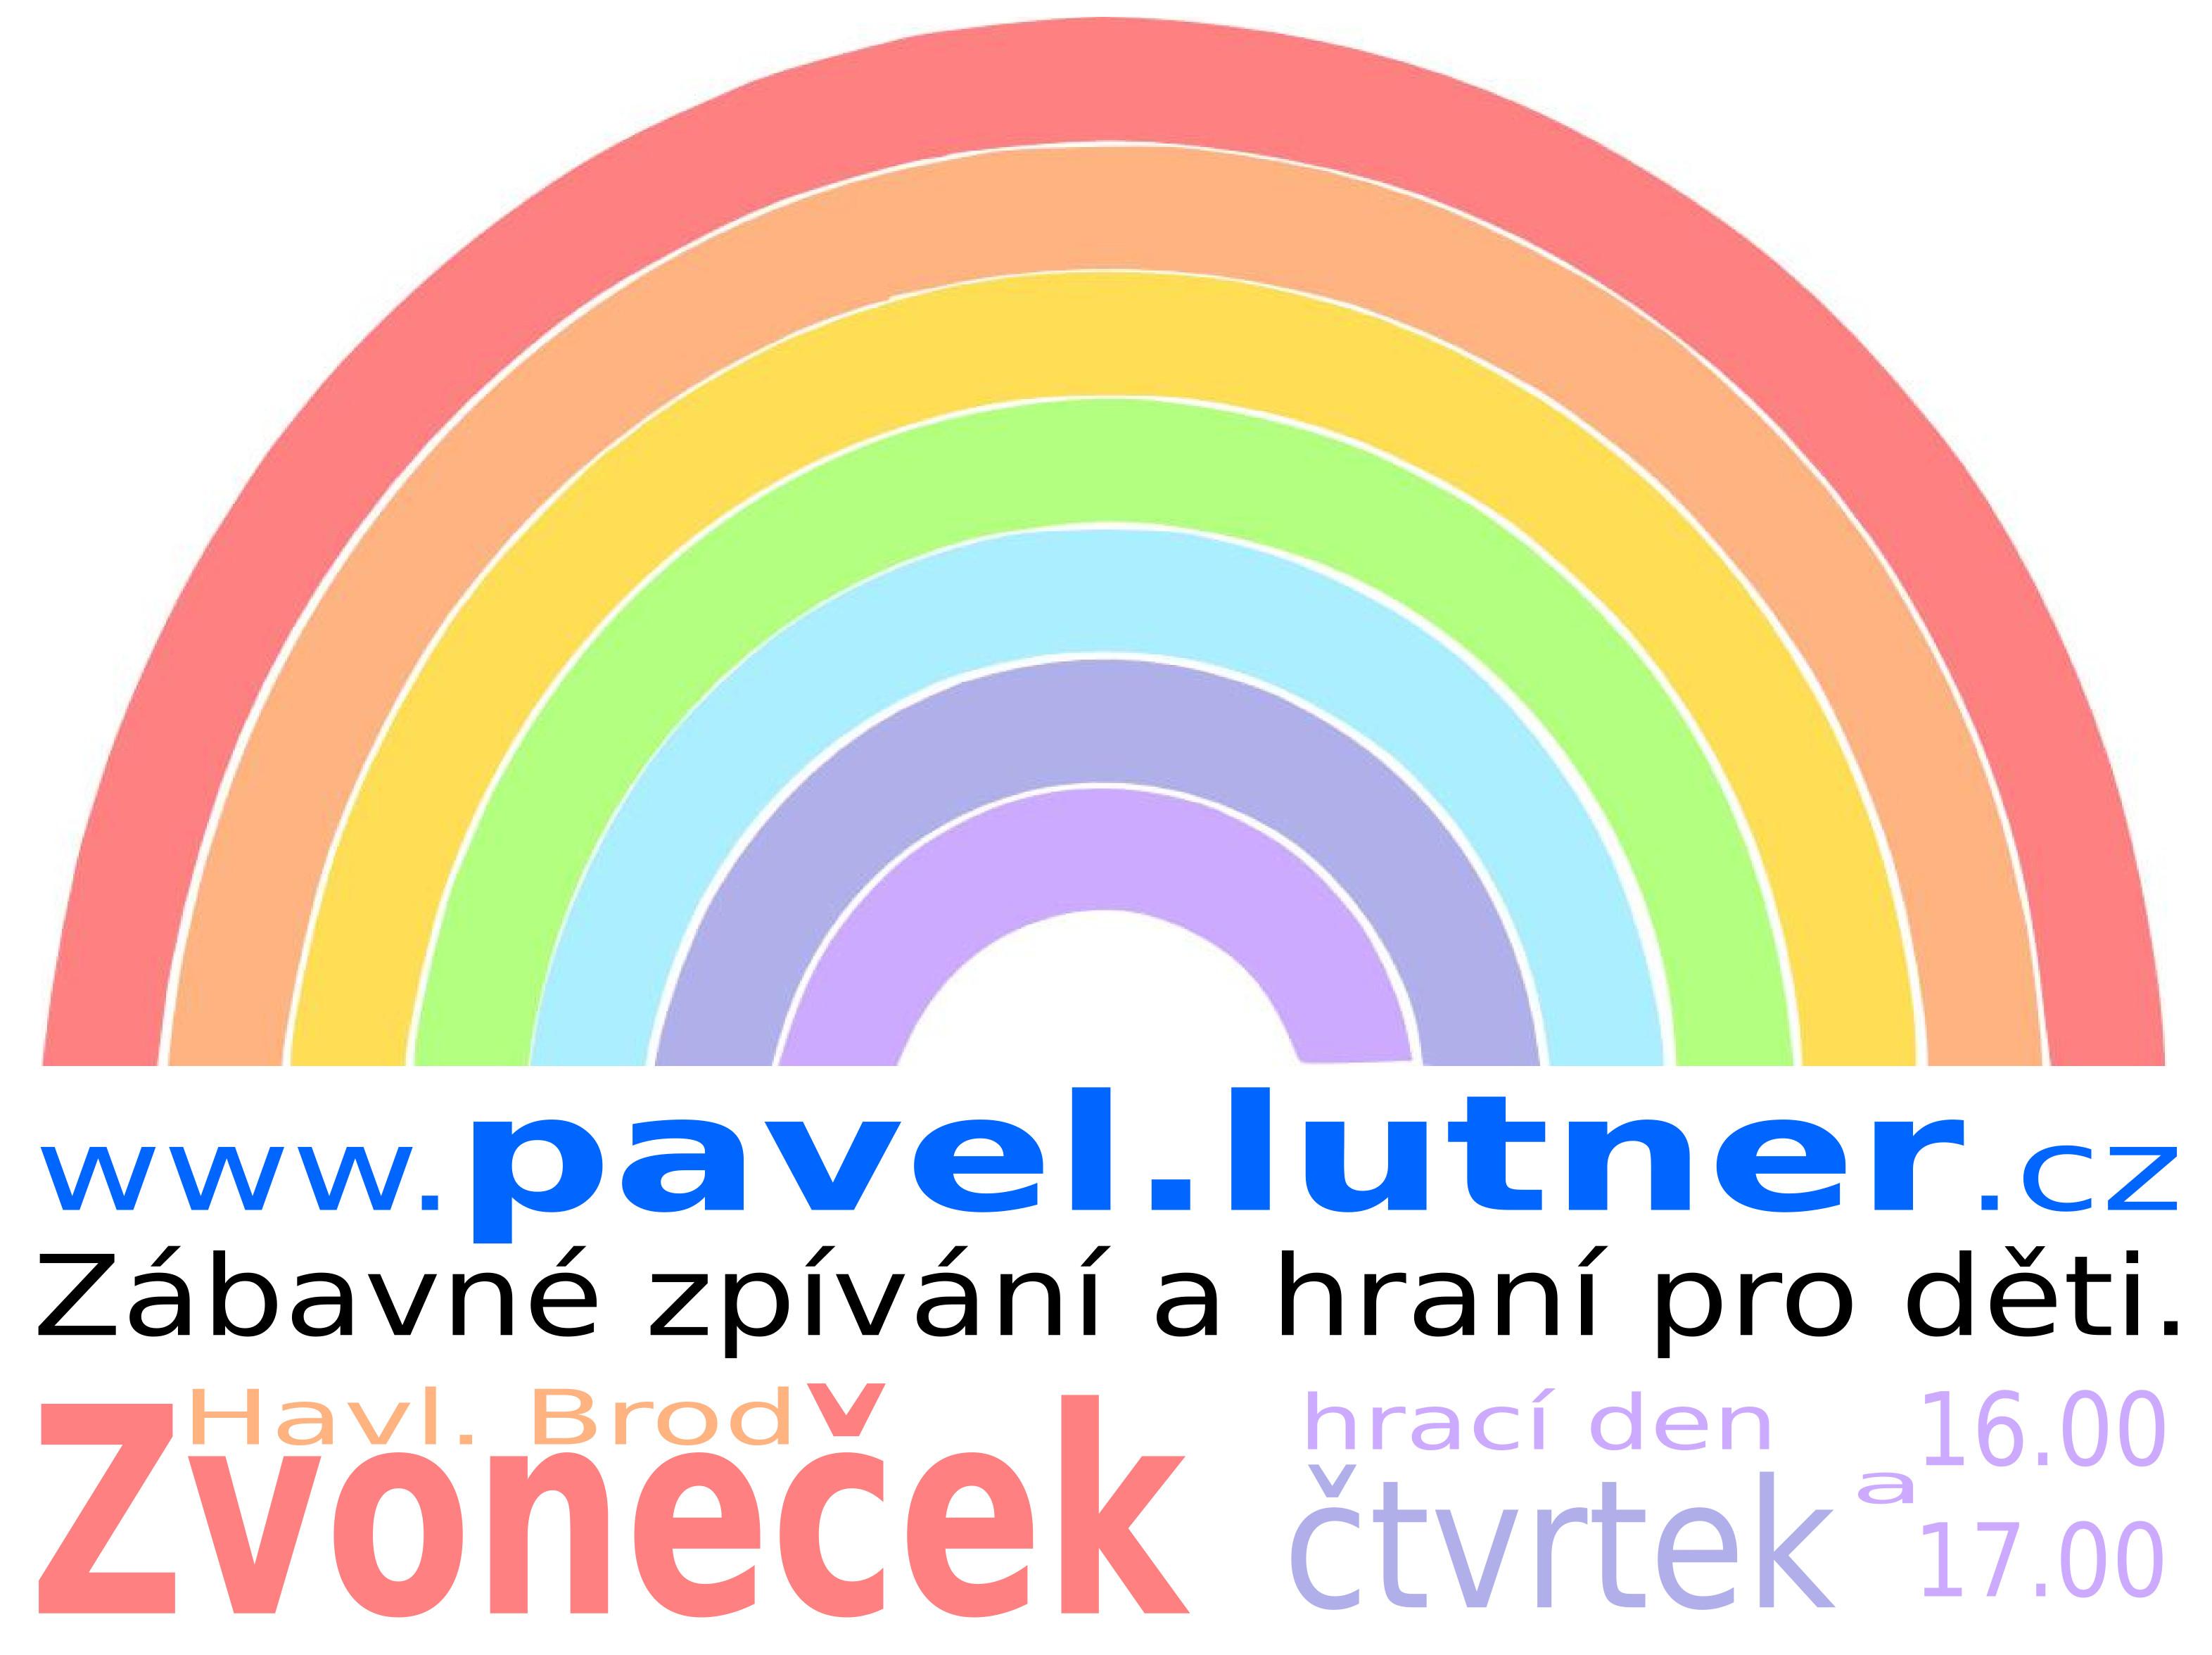 duha logo pro 2016 - 2017 - Zvoneček